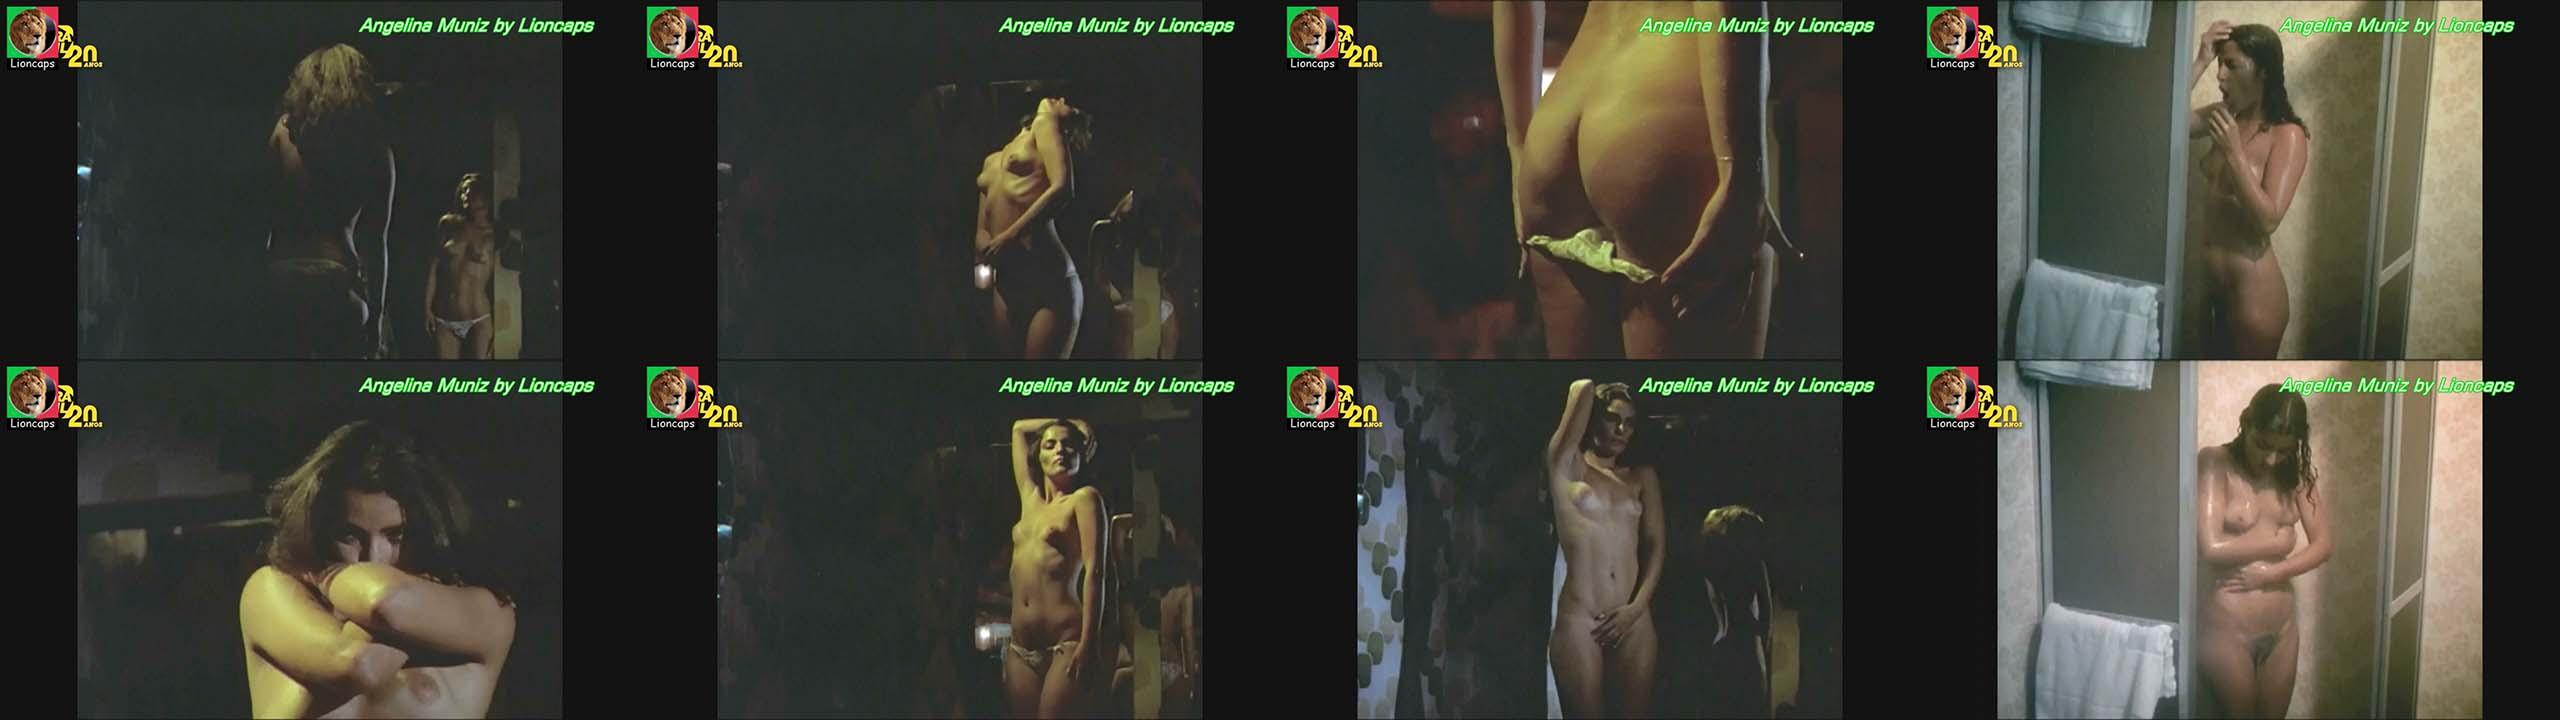 031312132_angelina_muniz_karina_objecto_1080_lioncaps_22_09_2018_03_123_222lo.jpg